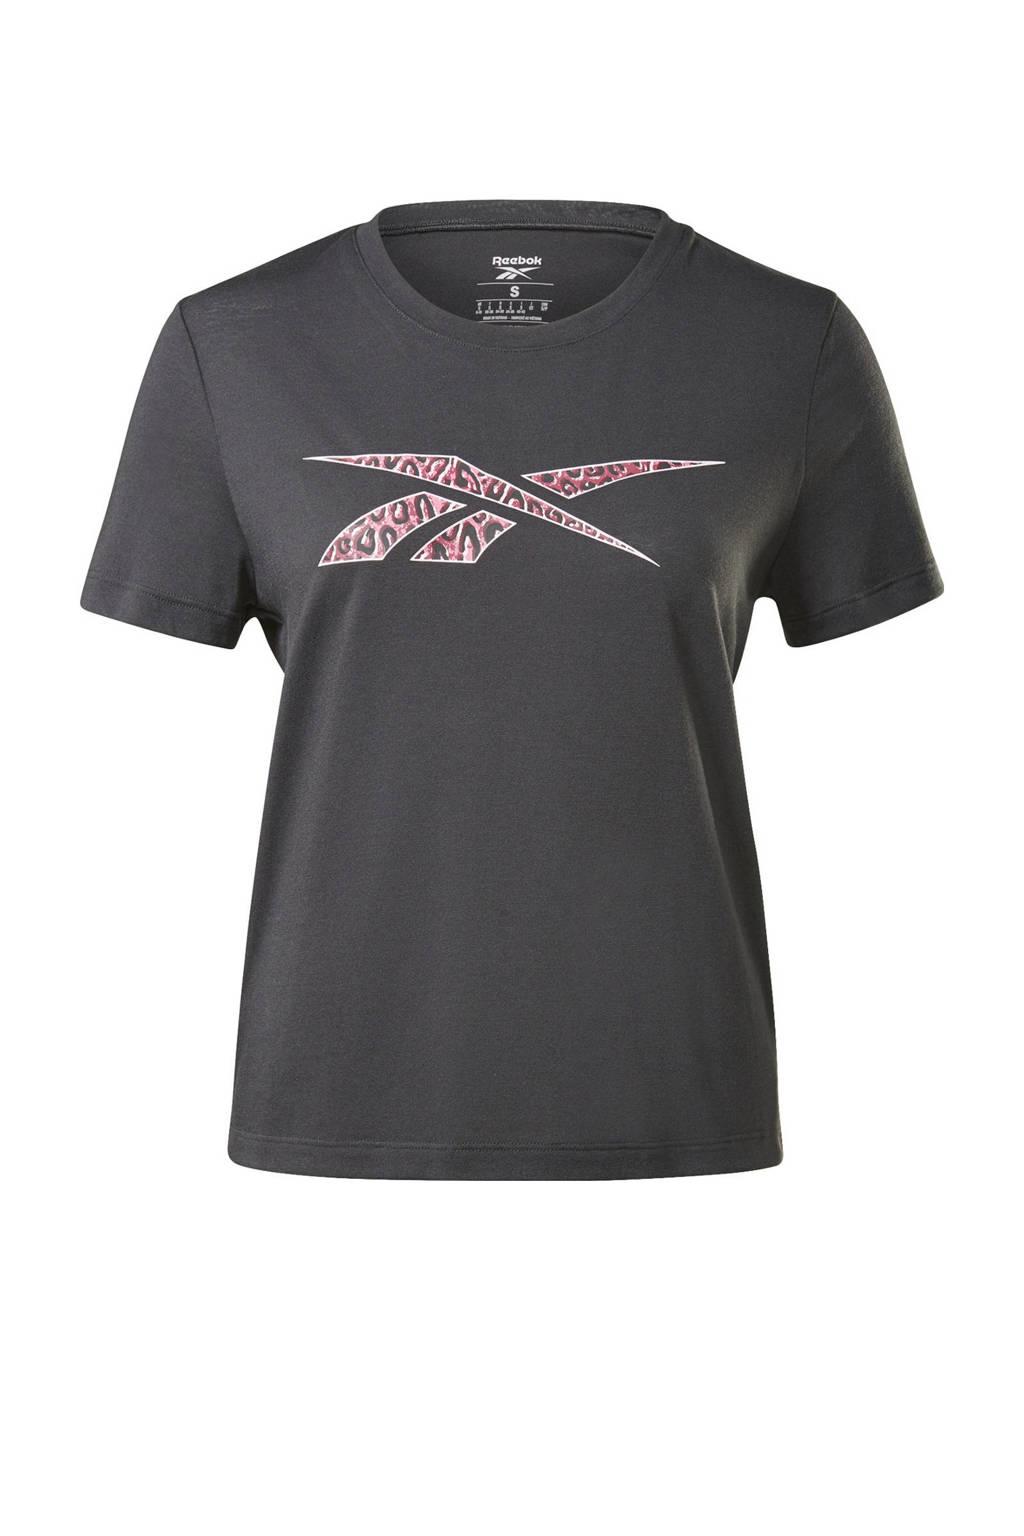 Reebok Training sport T-shirt antraciet/roze, Antraciet/roze